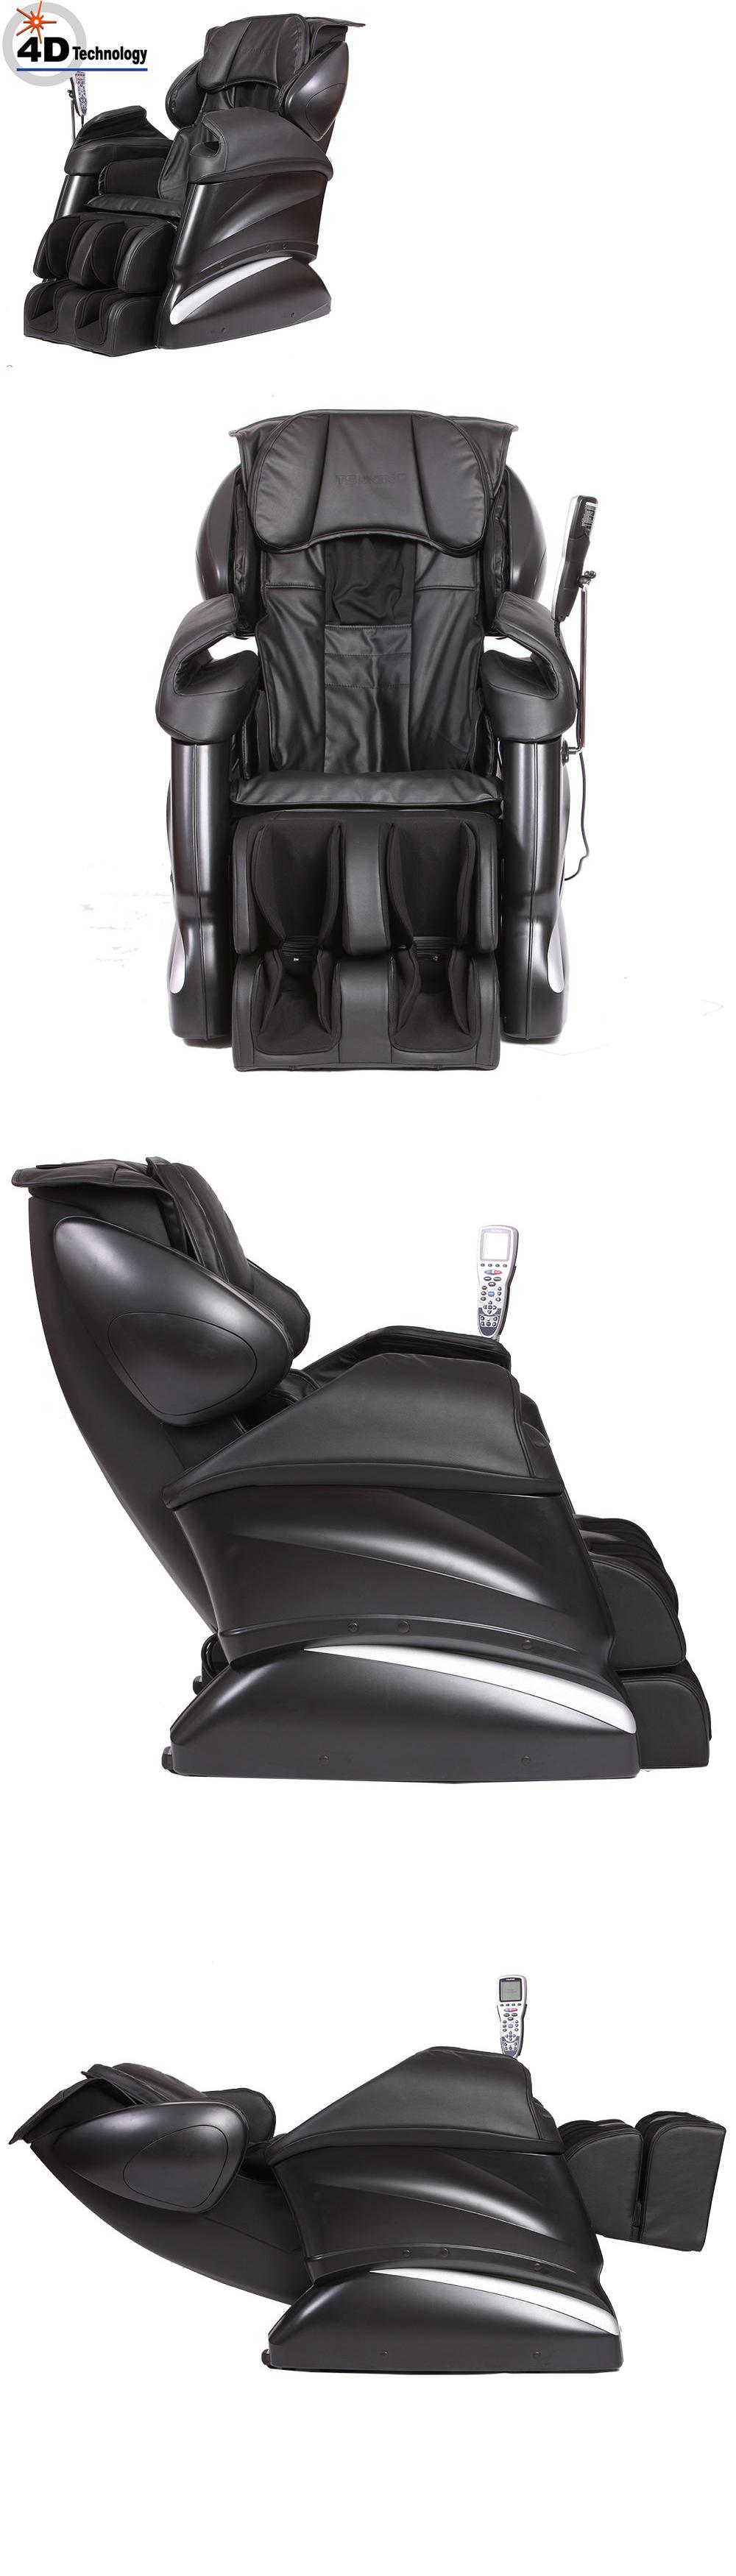 Electric Massage Chairs Openbox Tsukino Innovative 4D Advanced